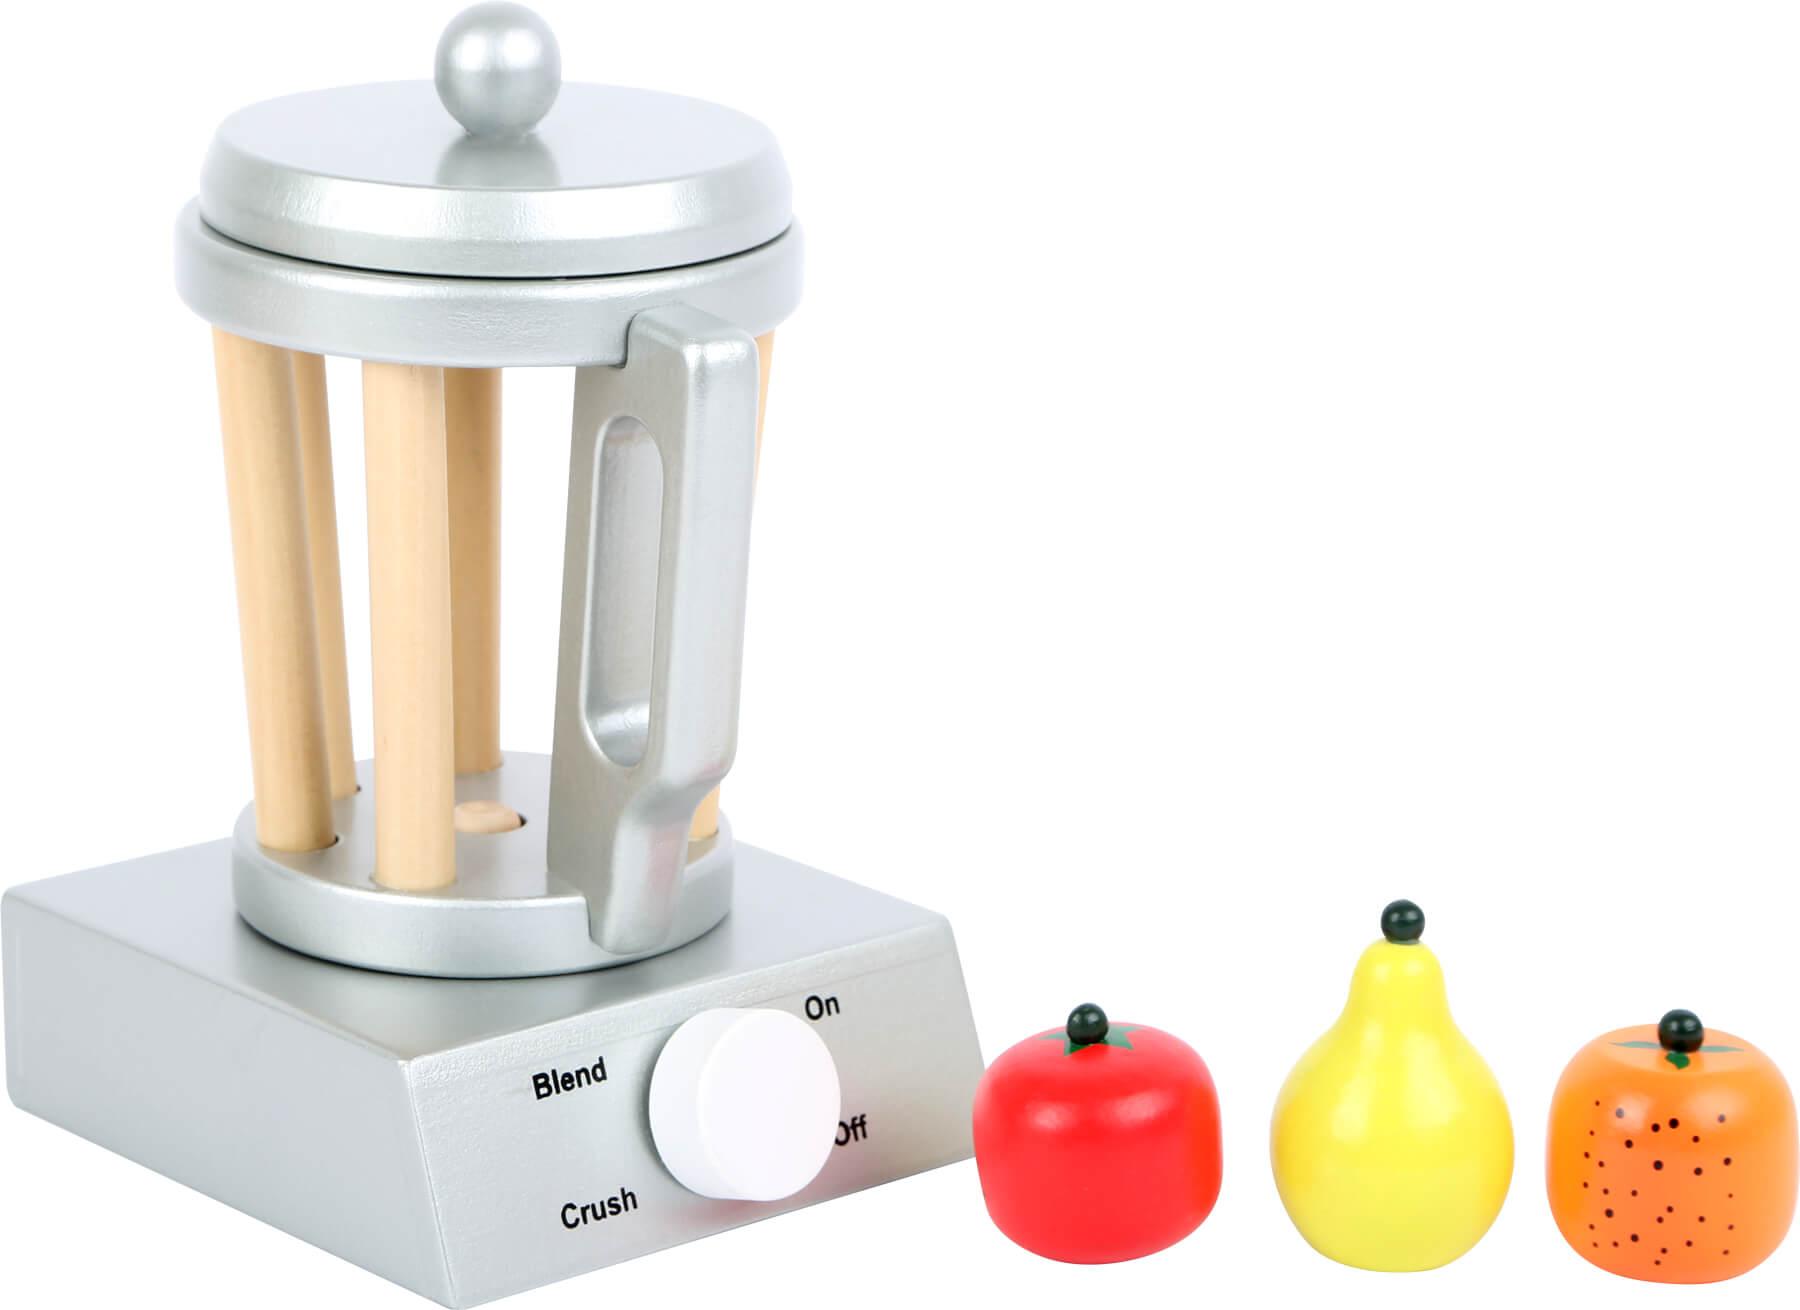 bimbi macchina per cucinare - 28 images - stunning bimbi macchina ...